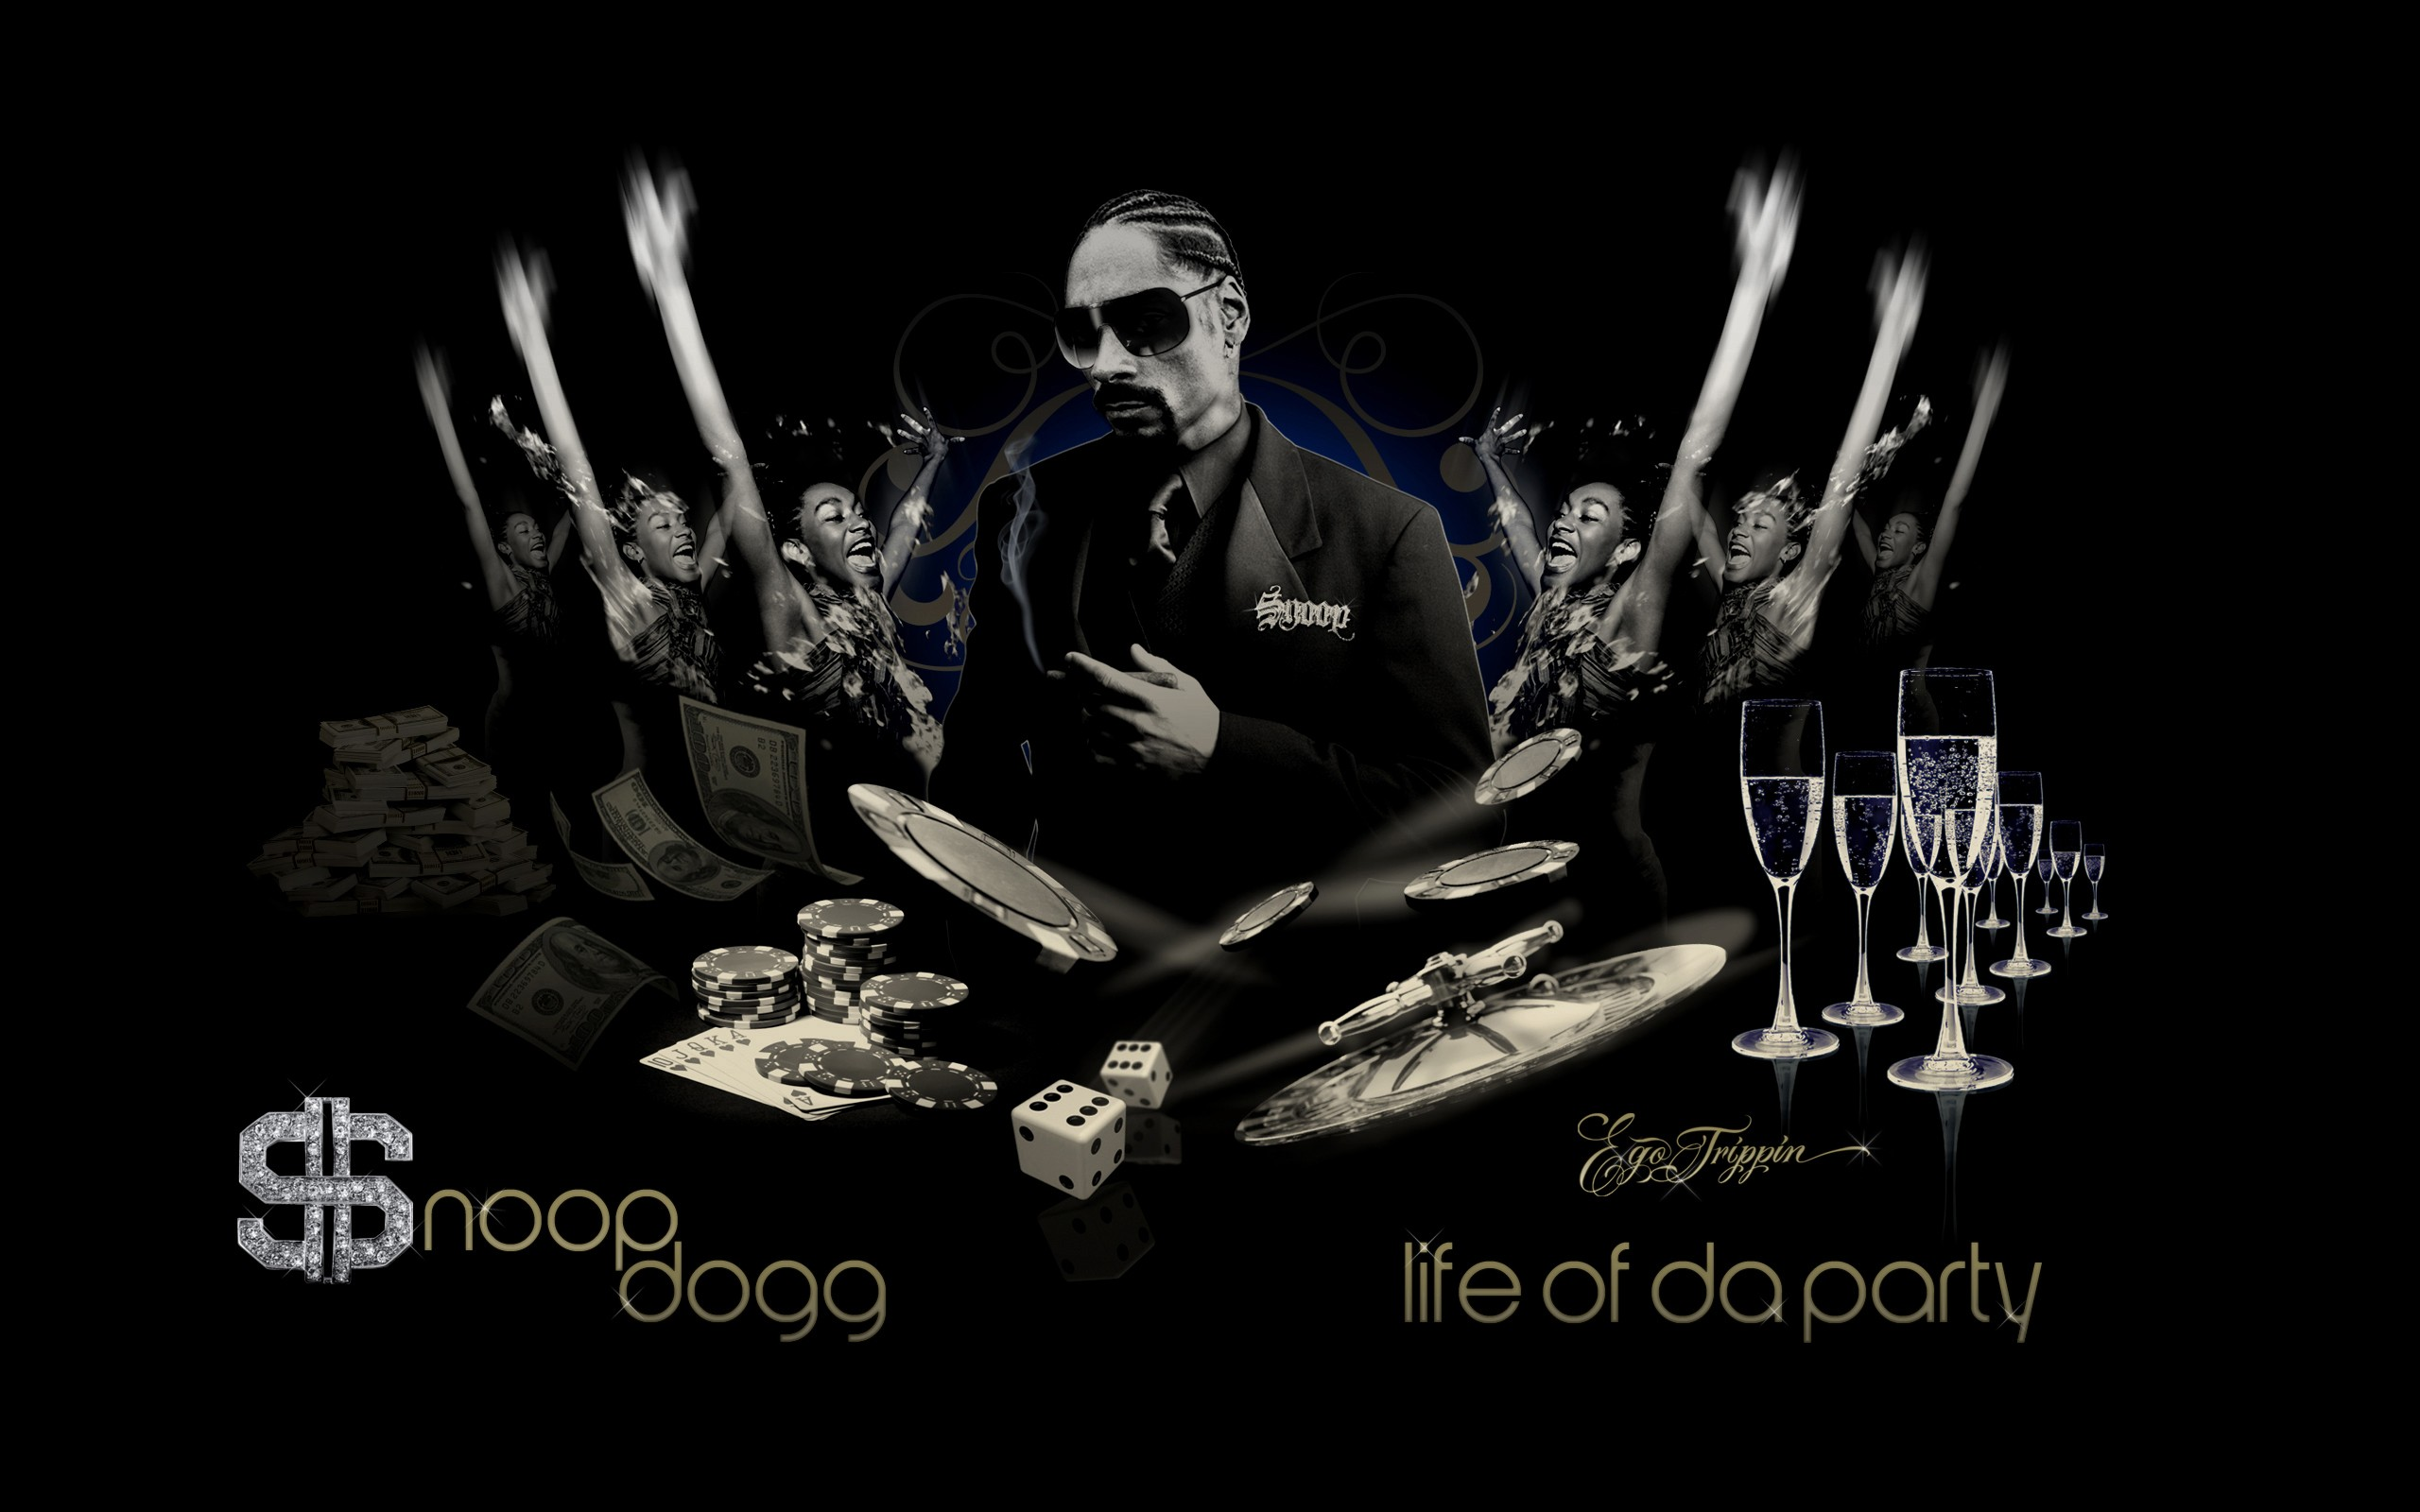 Dogg Wallpapers Gangsta Life Snoop HD 2560x1600